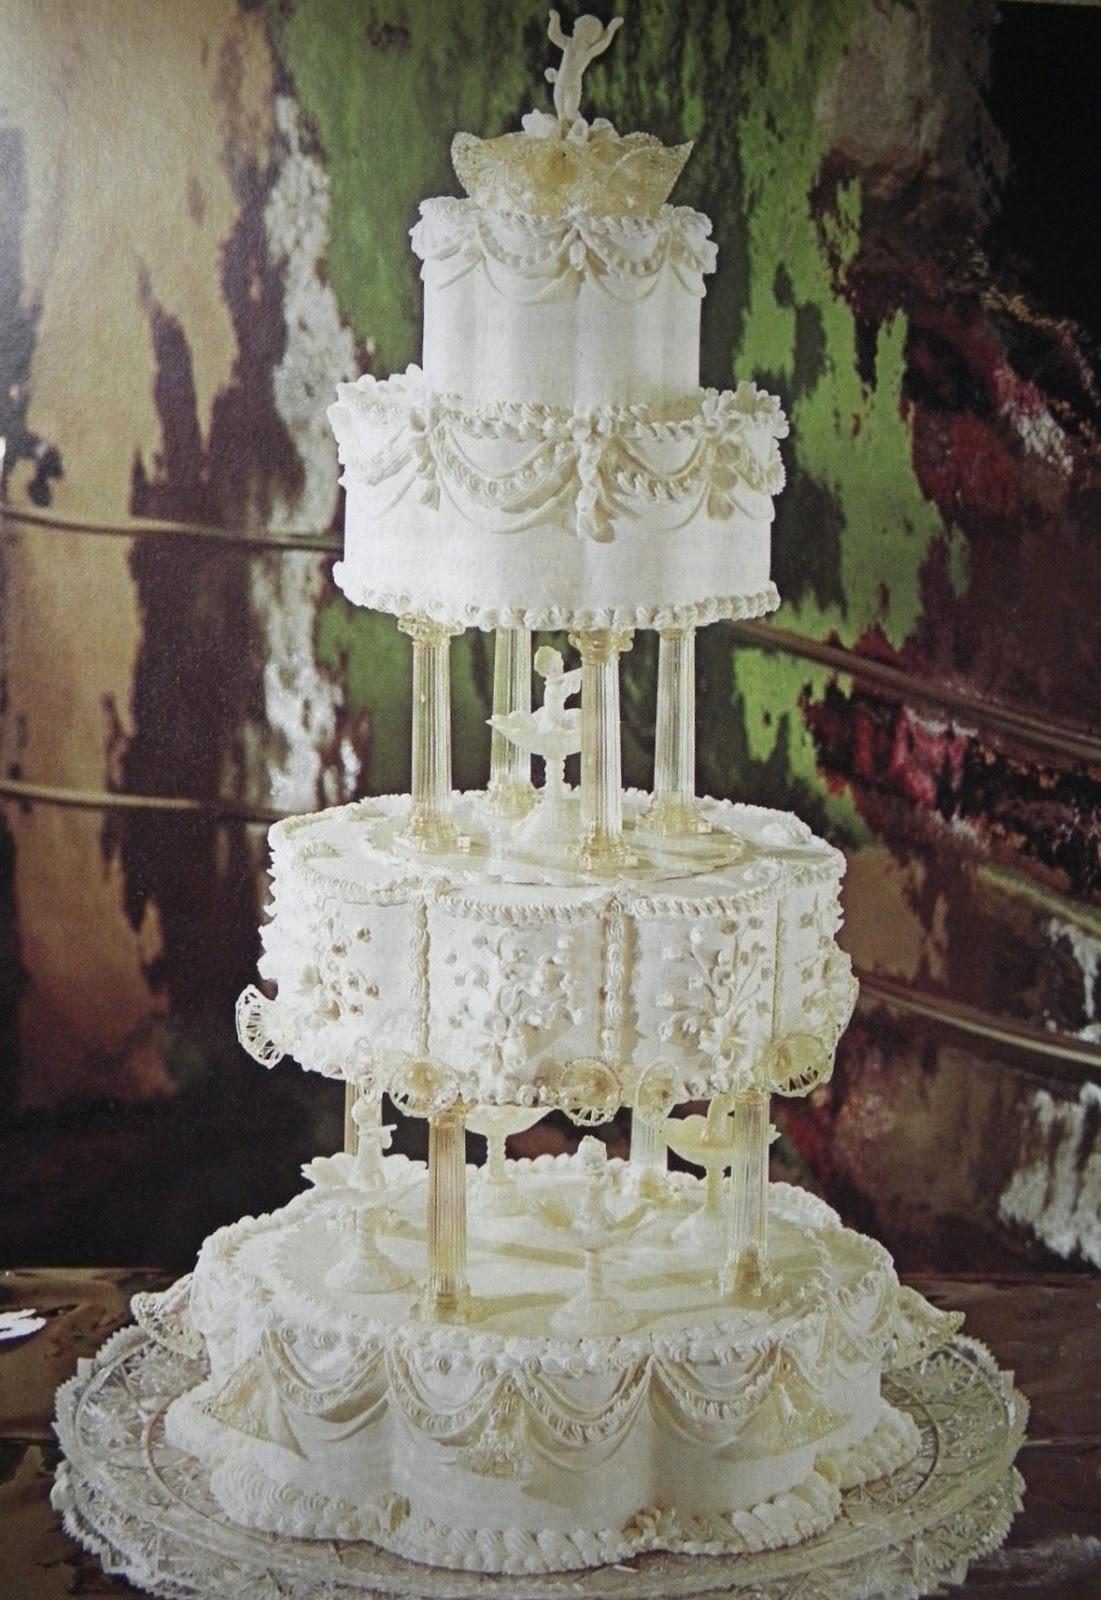 Wilton Wedding Cakes  Good Things by David Vintage Wilton Yearbook